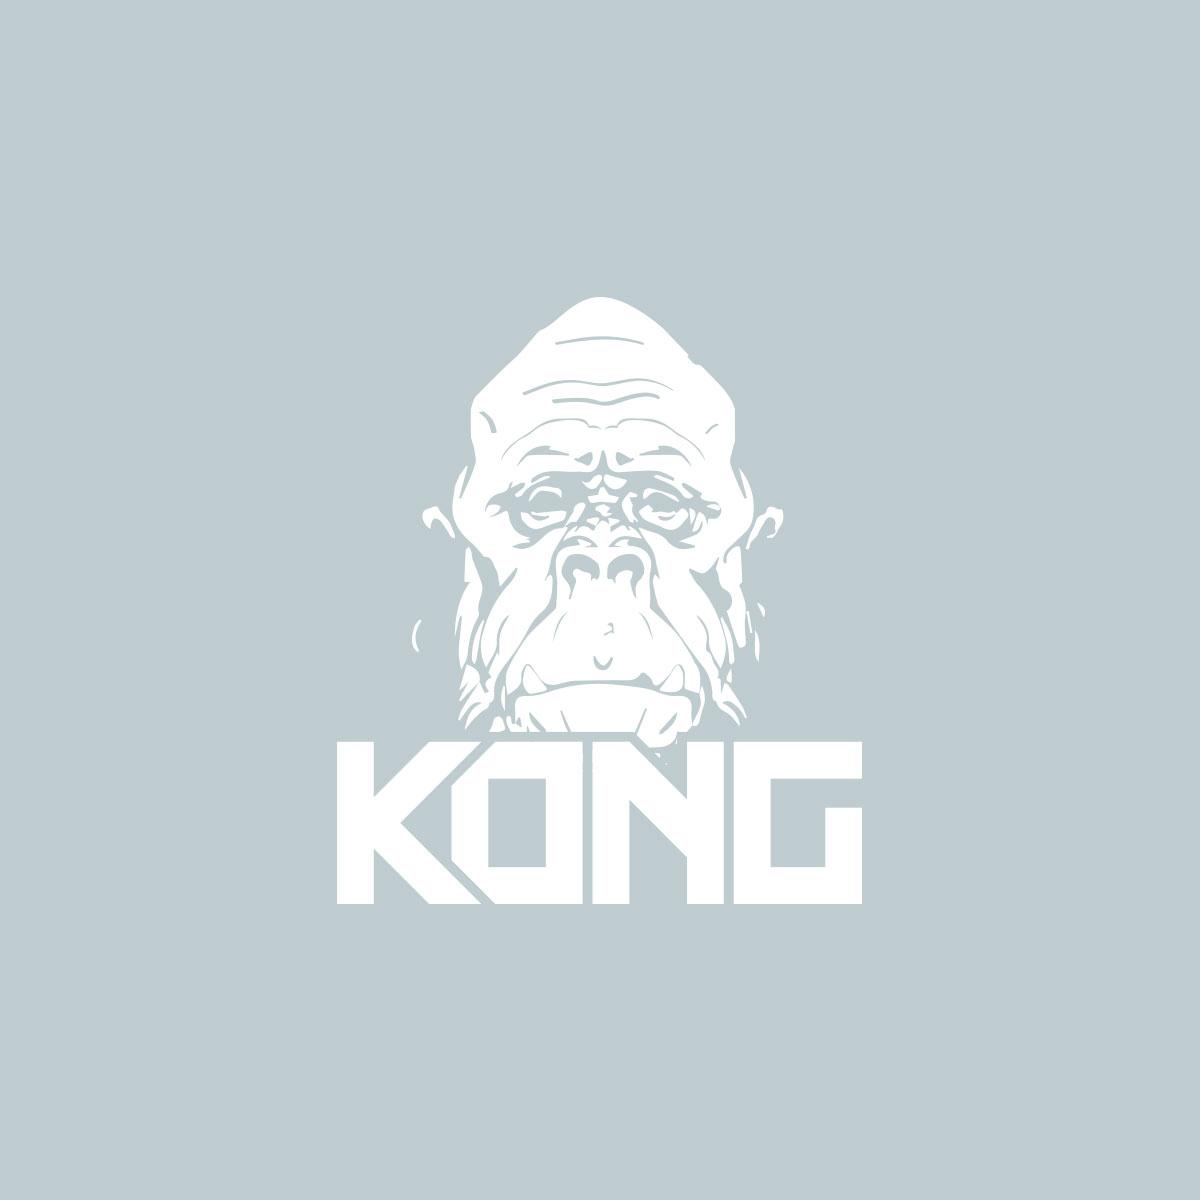 Kong Logo Design Art - Design Umberto Angelini